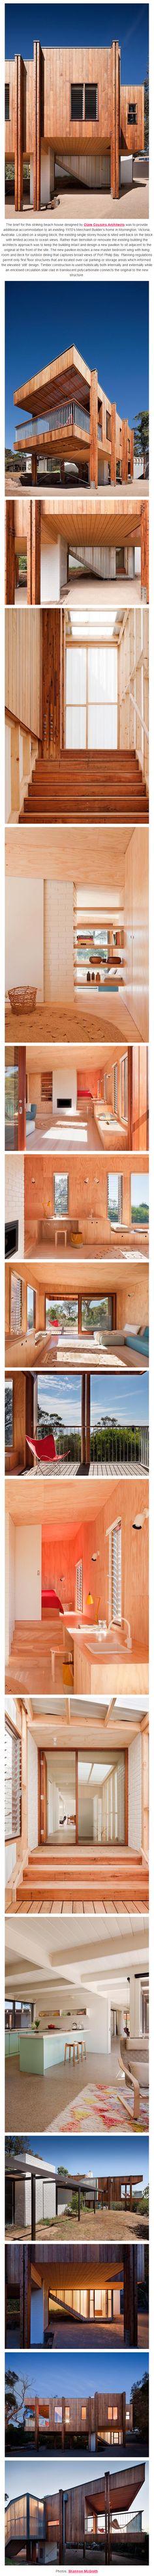 Striking modern beach house in Mornington